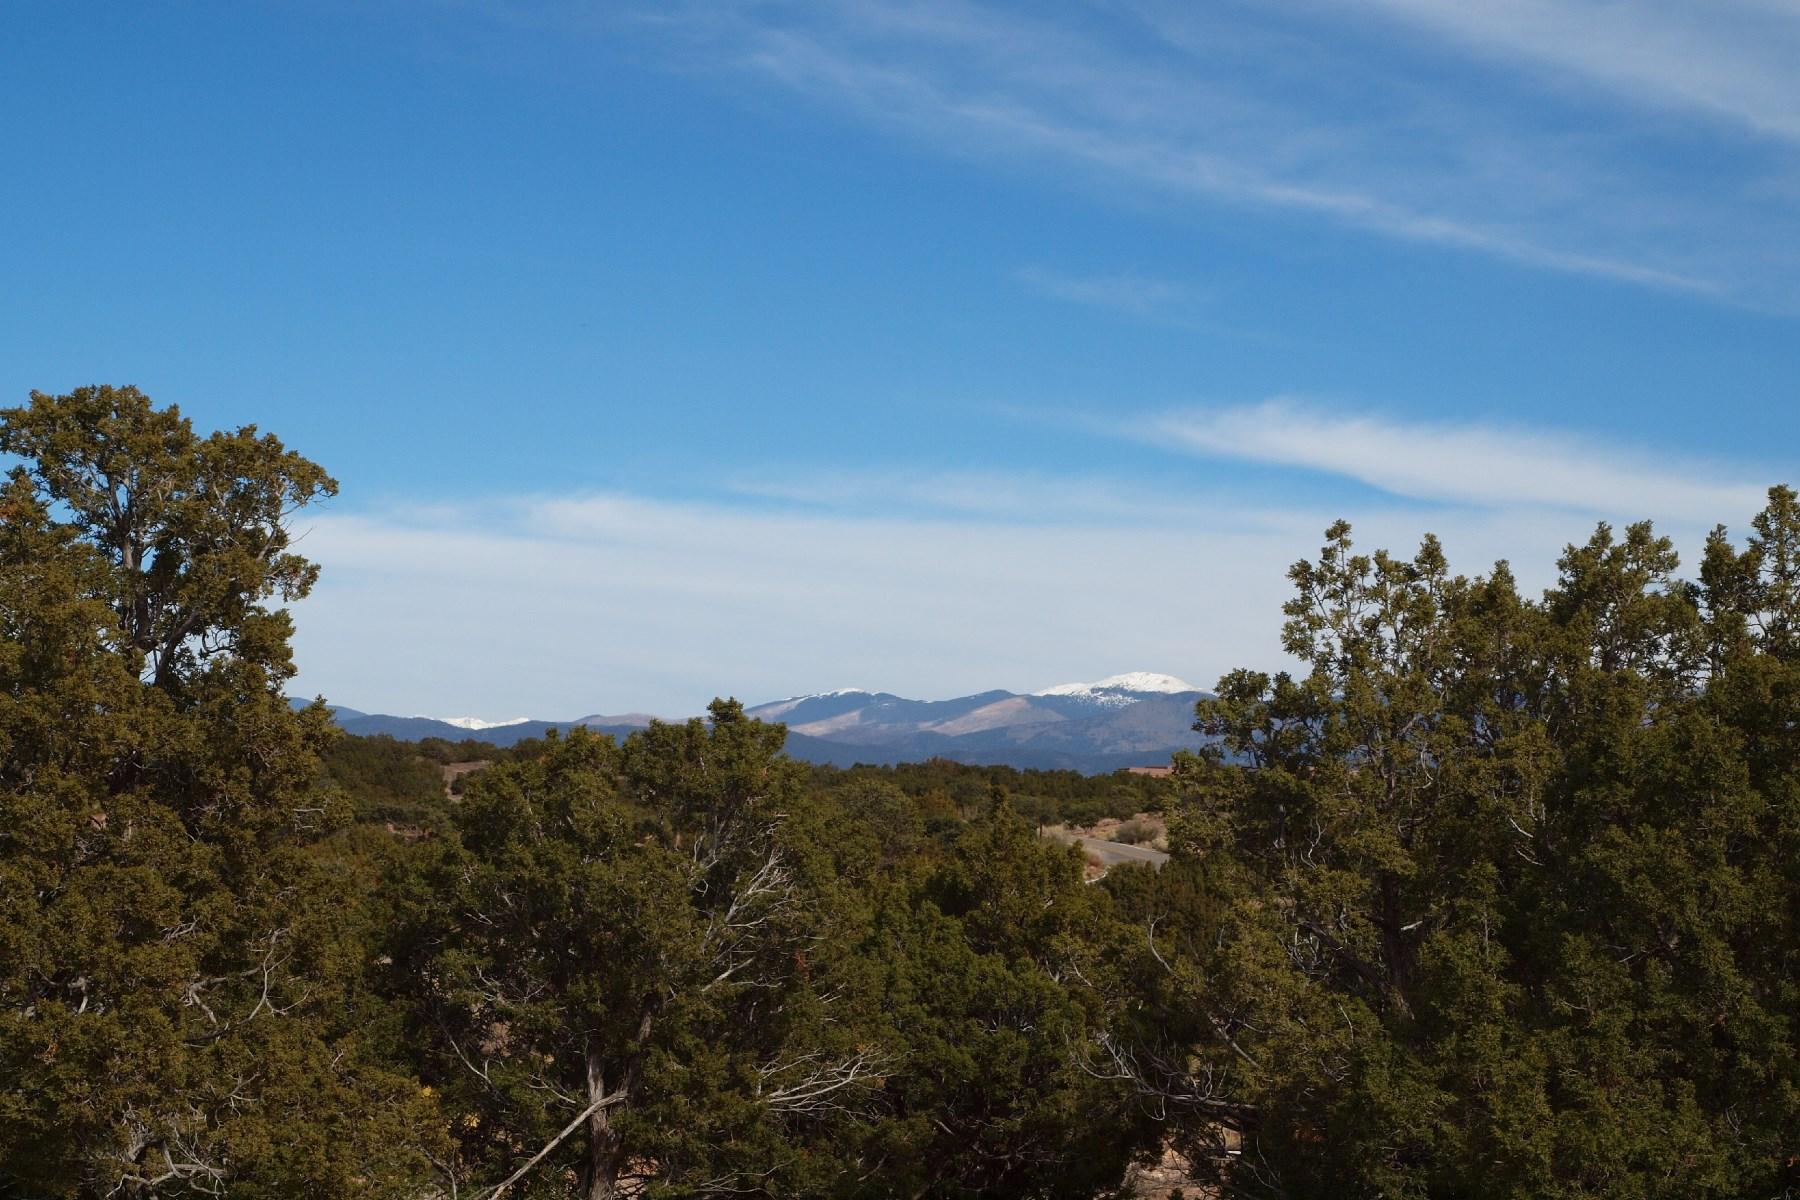 Land for Sale at Lot 21 La Vida Court Santa Fe City Northwest, Santa Fe, New Mexico 87506 United States